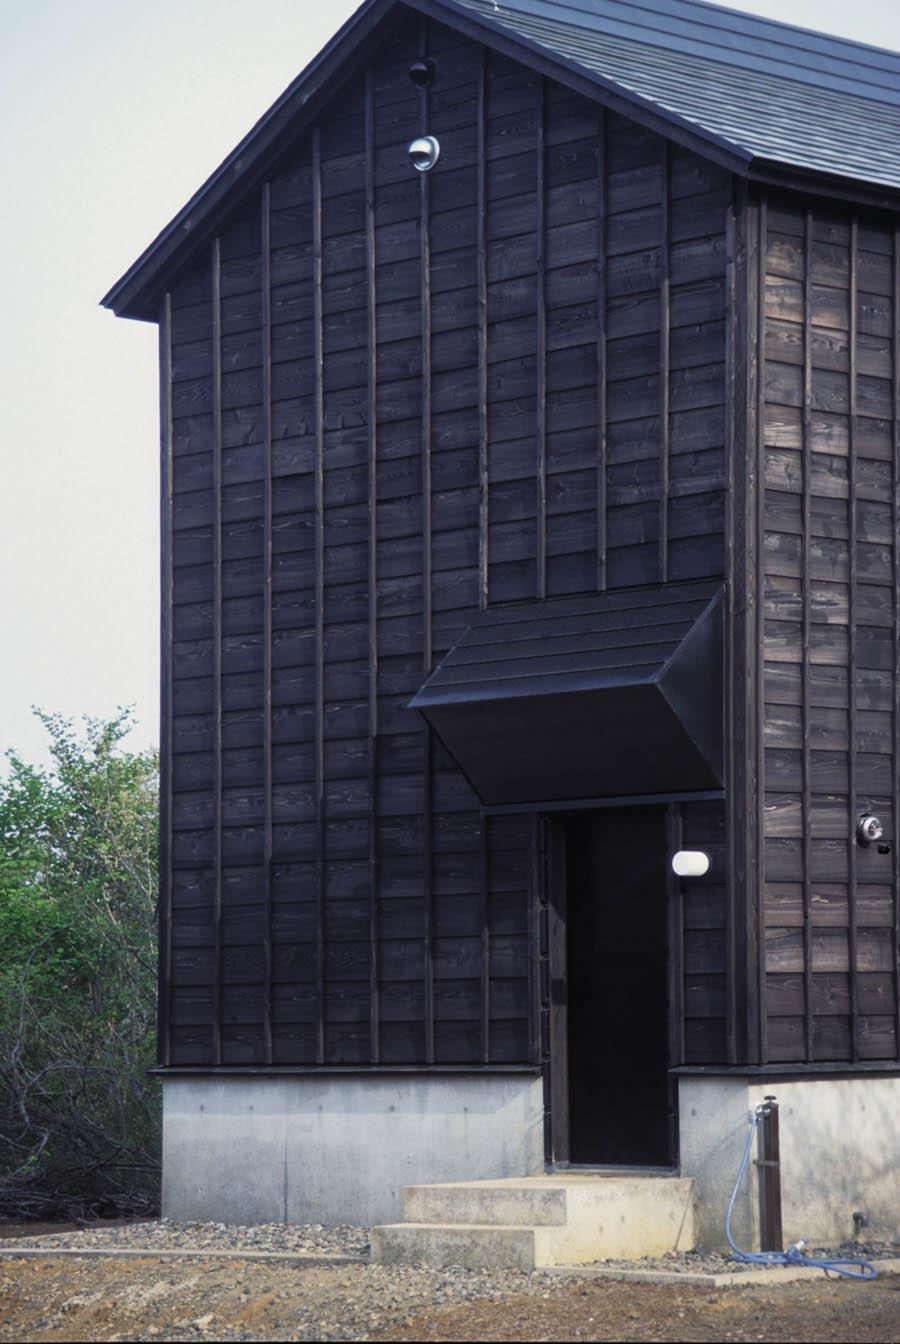 Cottage in Tsumari by Daigo Ishii + Future-scape Architects